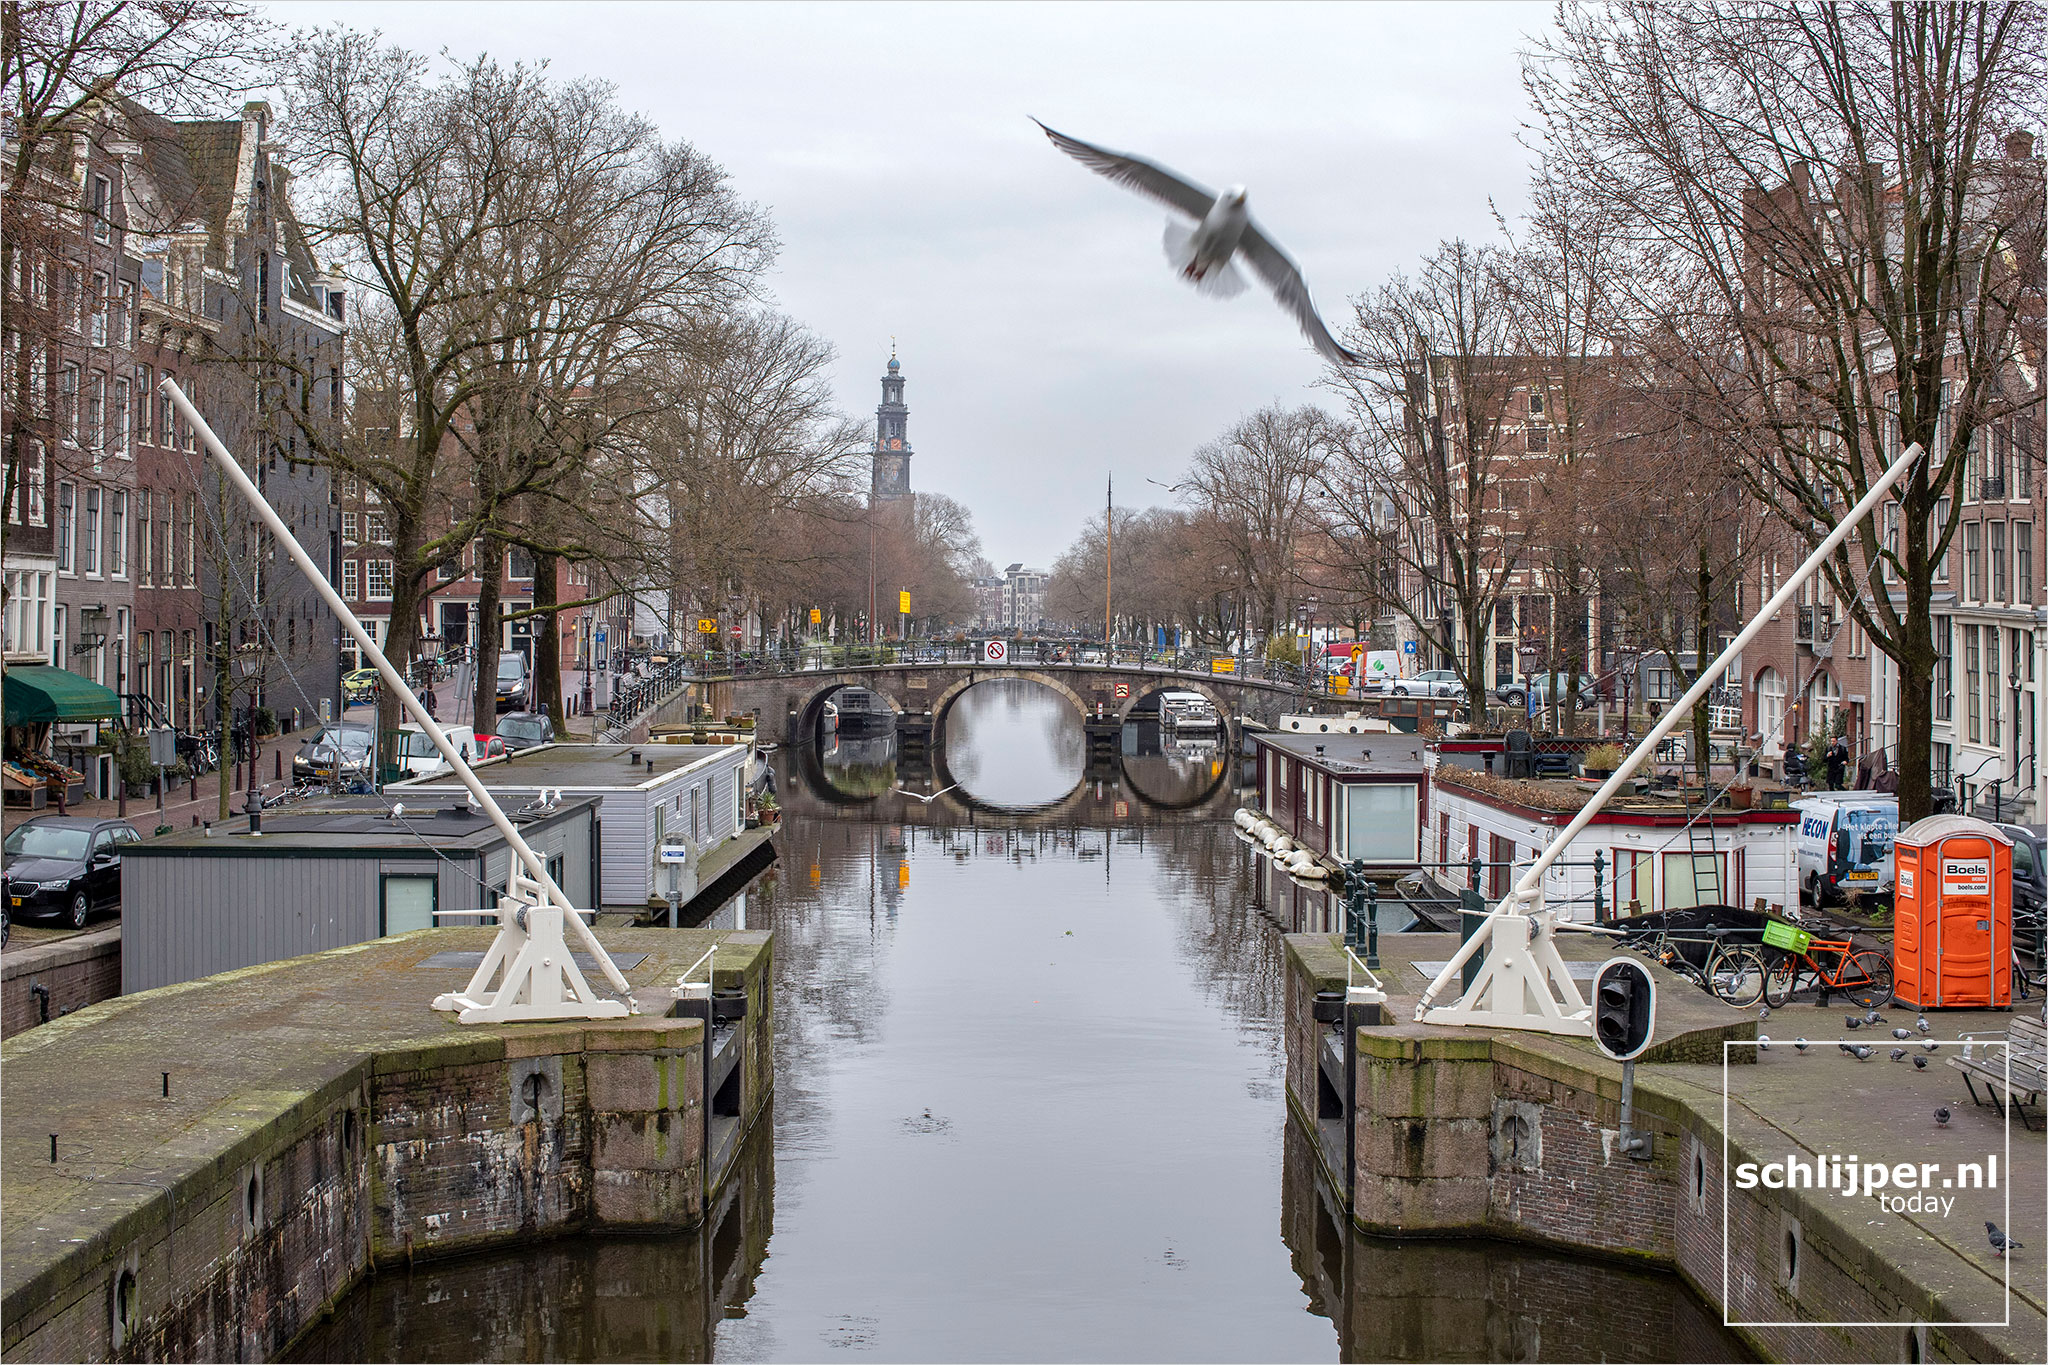 The Netherlands, Amsterdam, 18 maart 2021